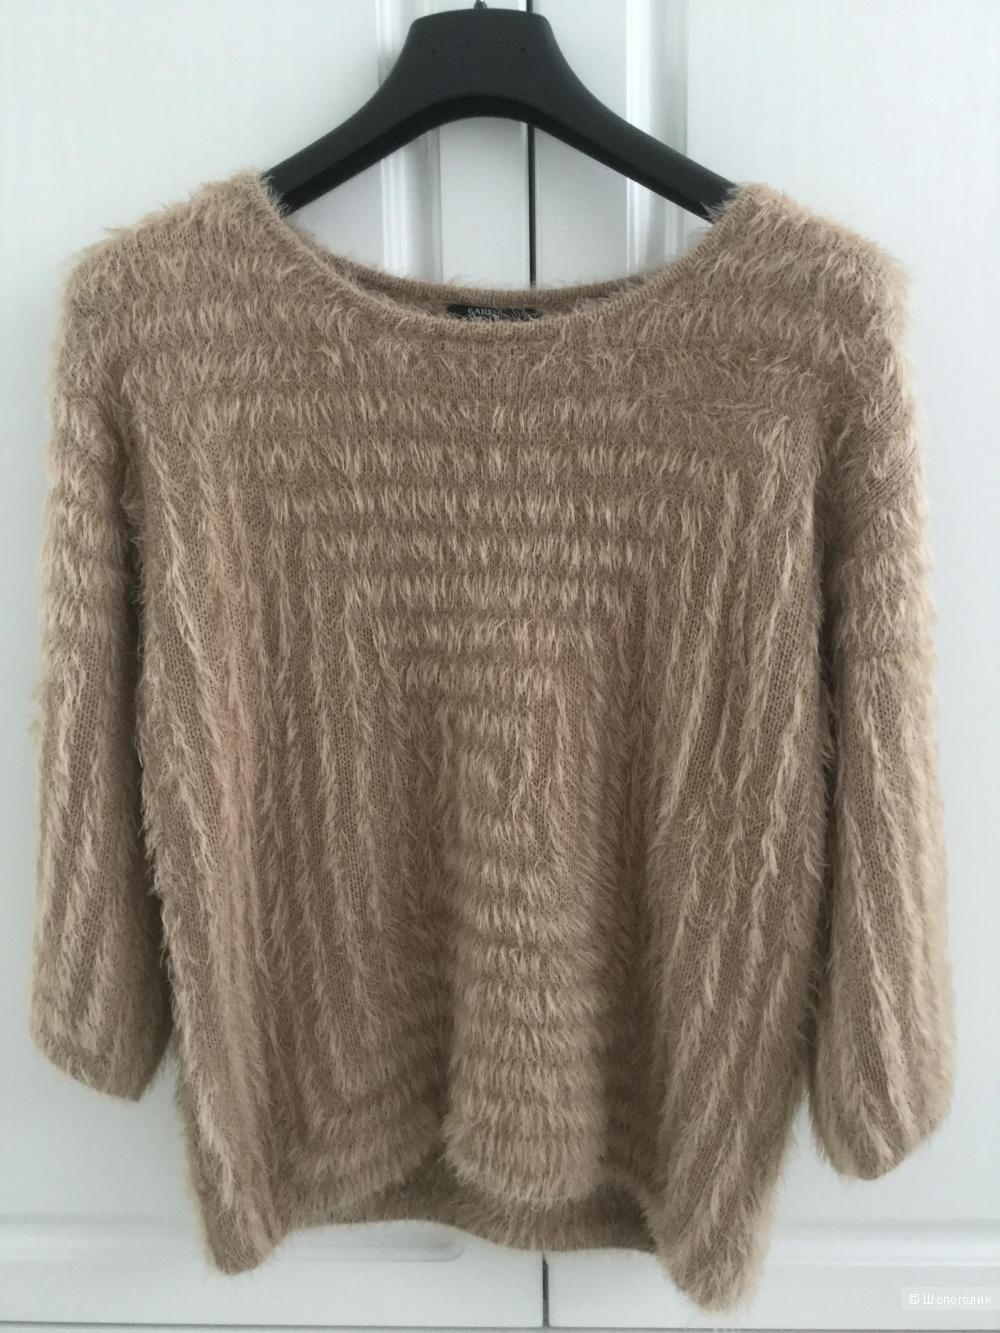 Пушистый свитер Care of you, размер M-L